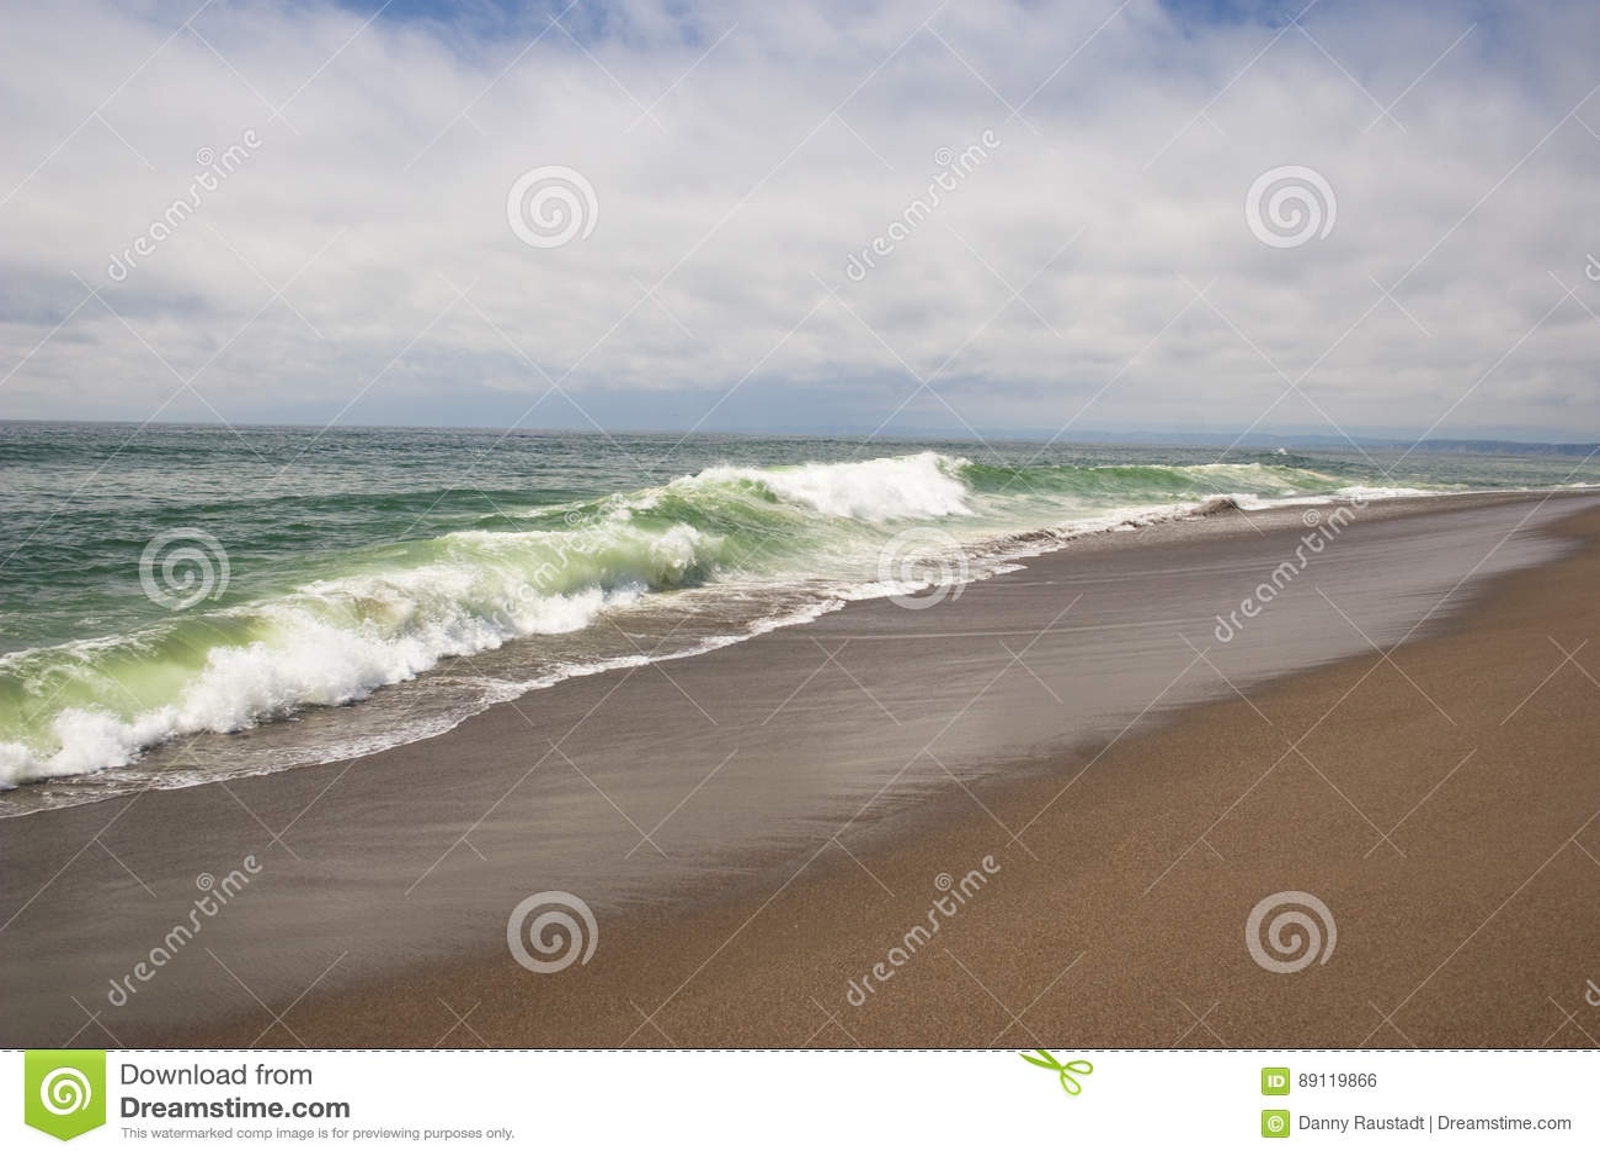 Southern California remote sandy ocean beach